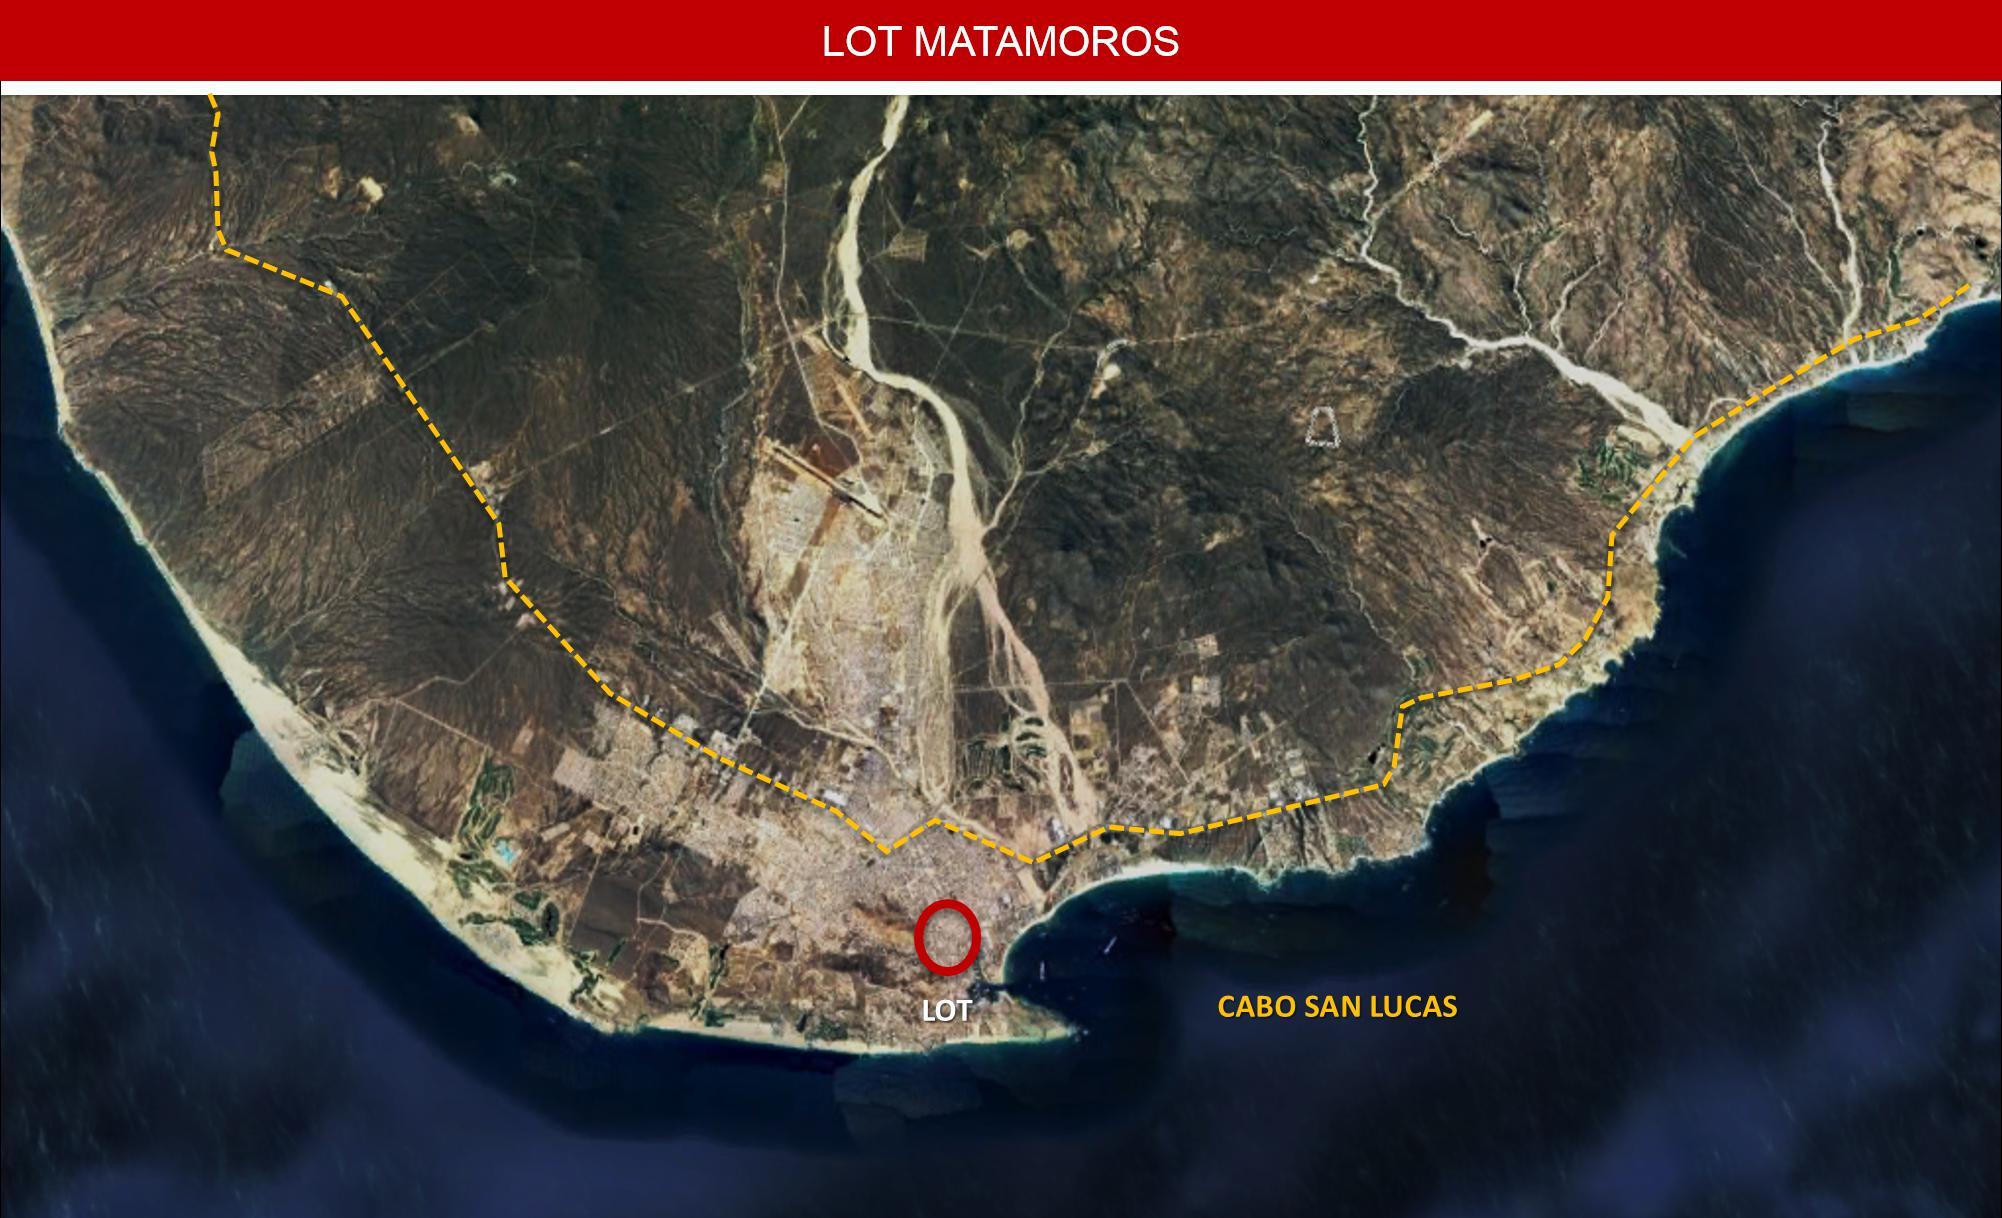 Lot Matamoros, Cabo San Lucas